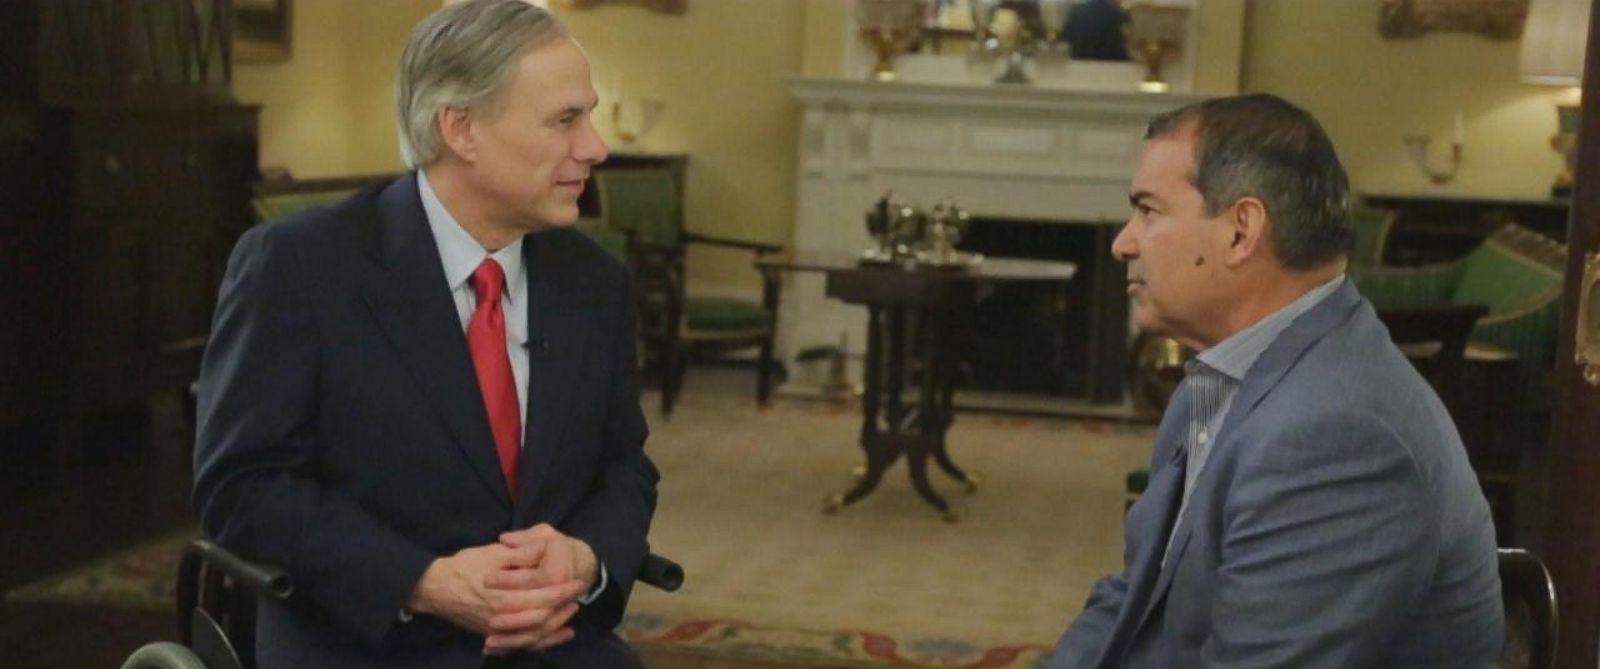 PHOTO: ABC News Jim Avila interviews Texas Gov. Greg Abbott about Obamas executive action on immigration.